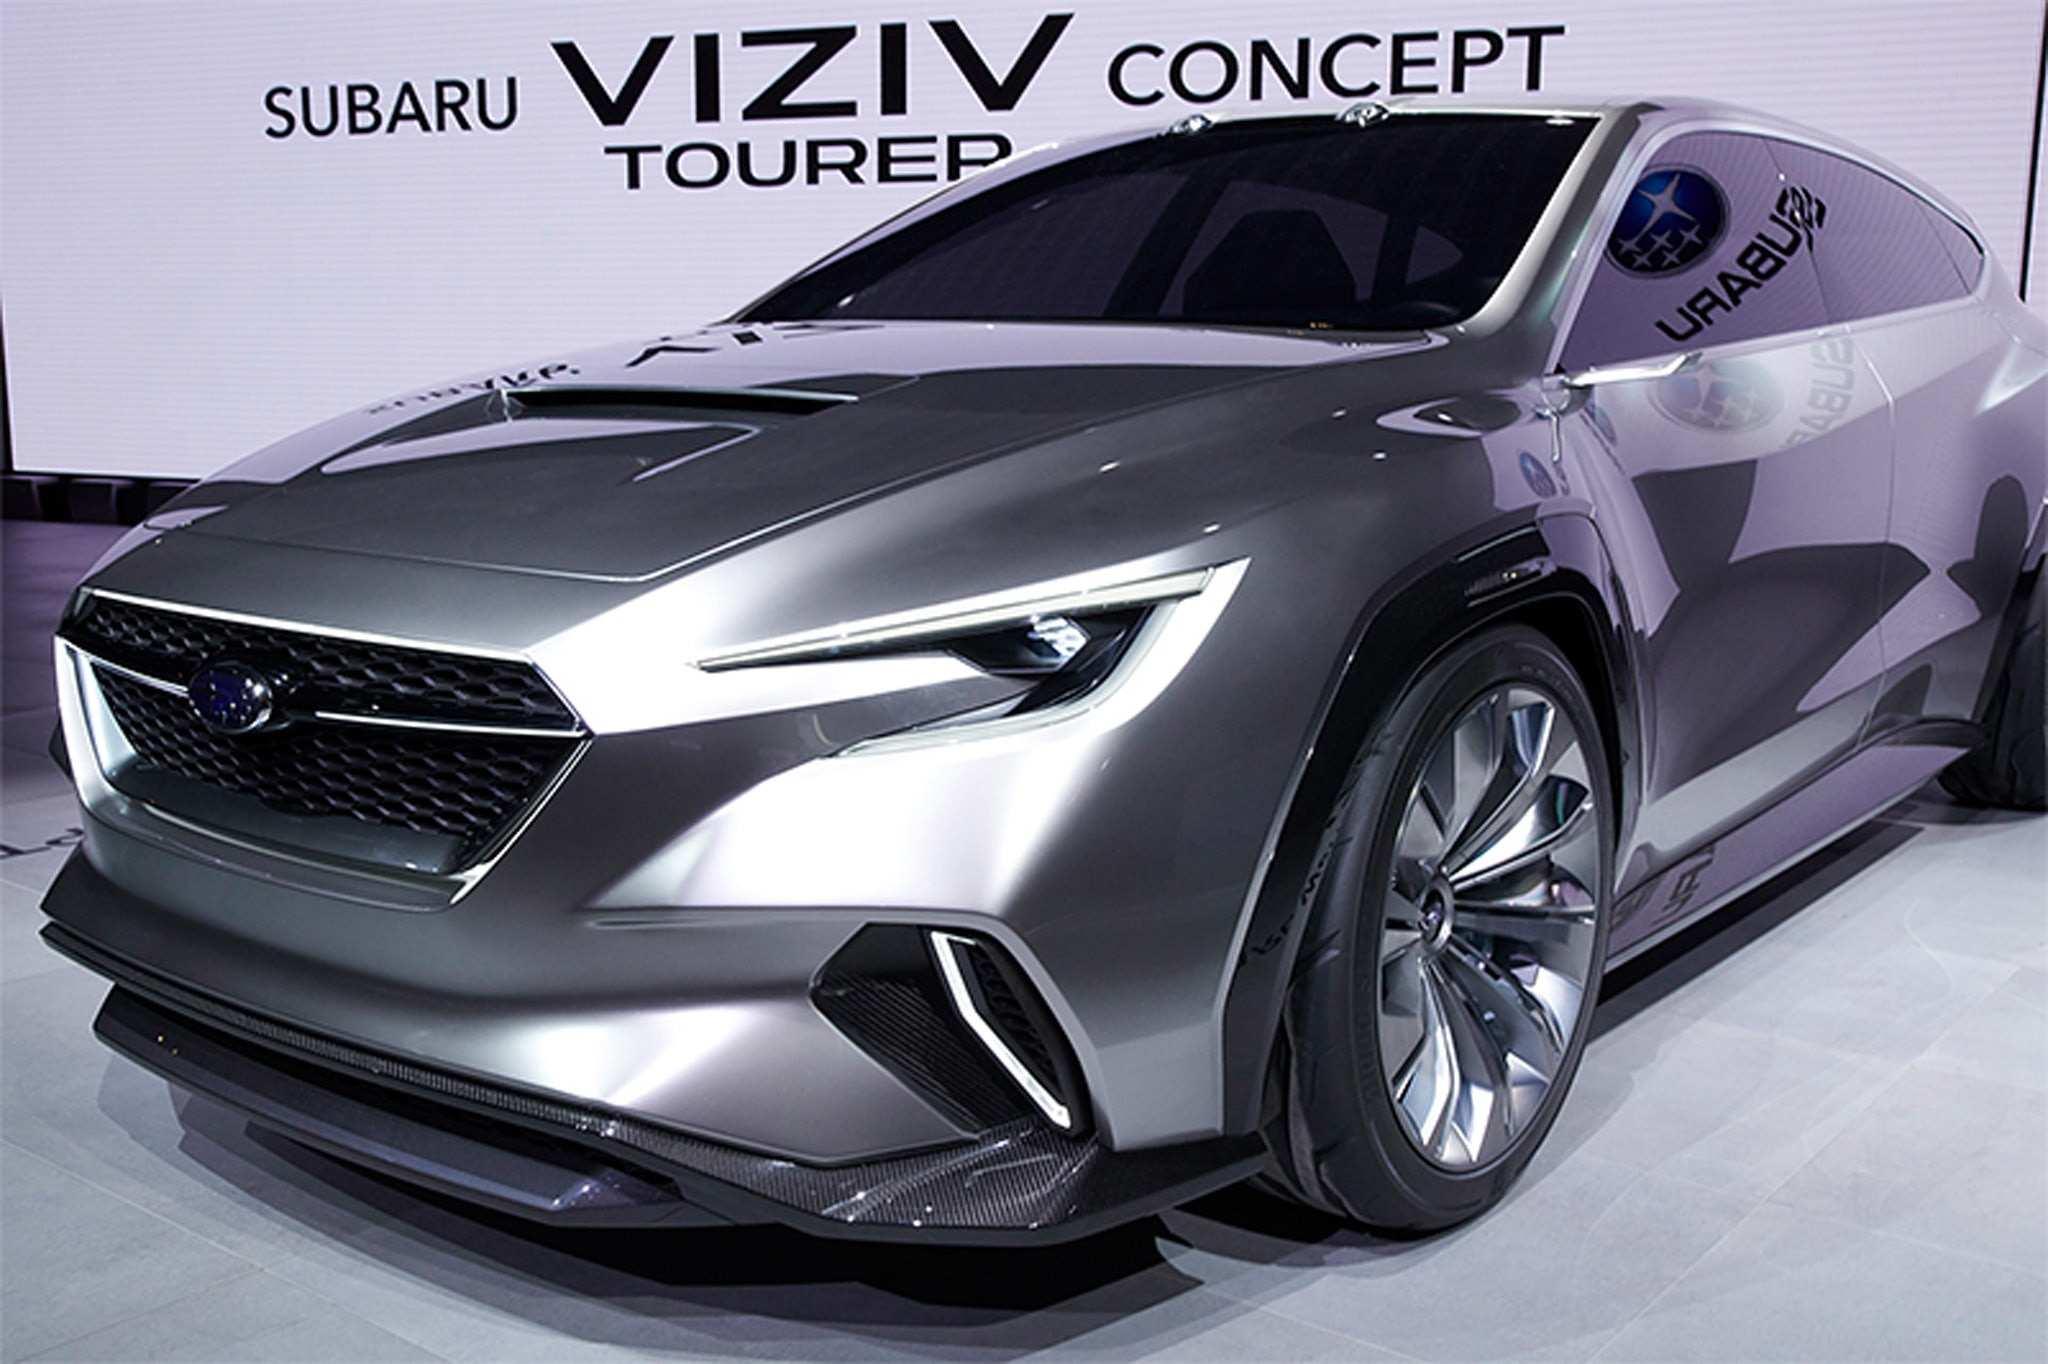 29 Best Review 2020 Subaru Viziv Pickup Release Date with 2020 Subaru Viziv Pickup